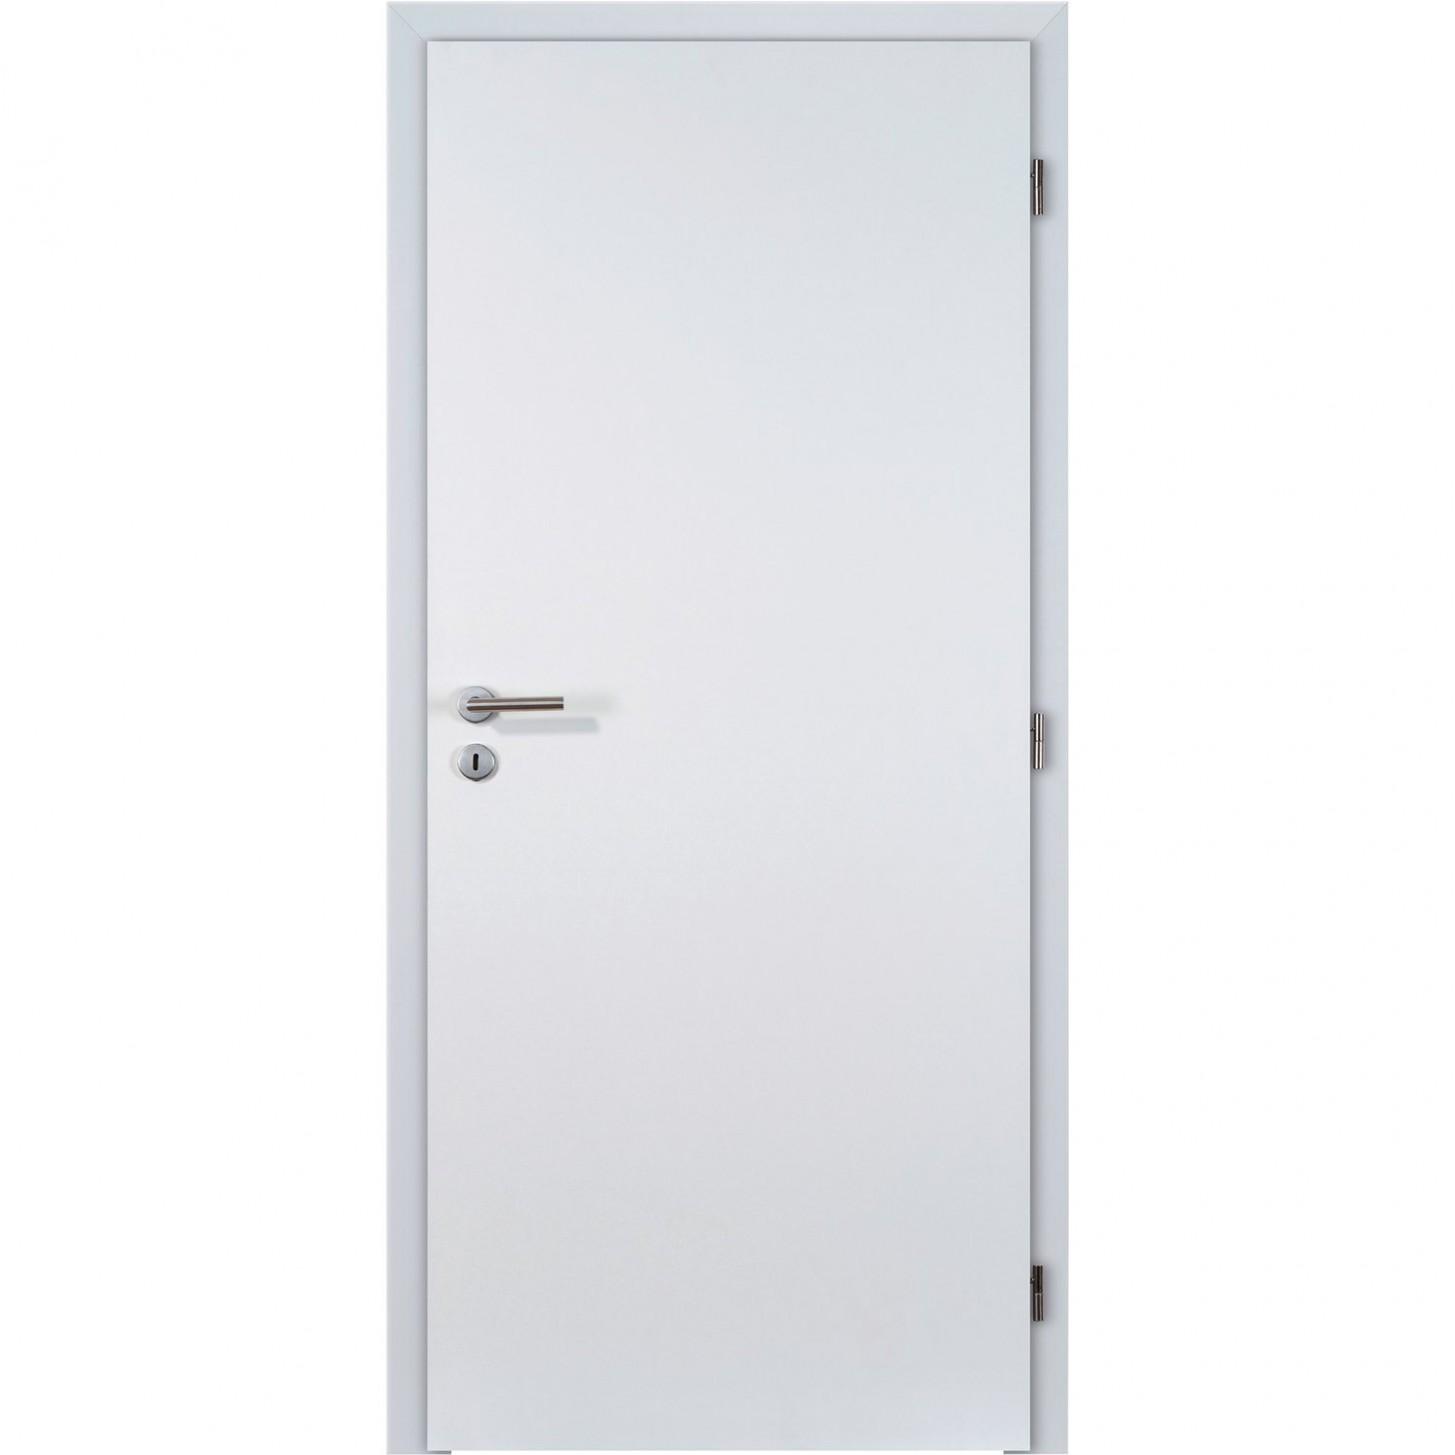 Masonite Interiérové dveře 4 L plné lakované bílé